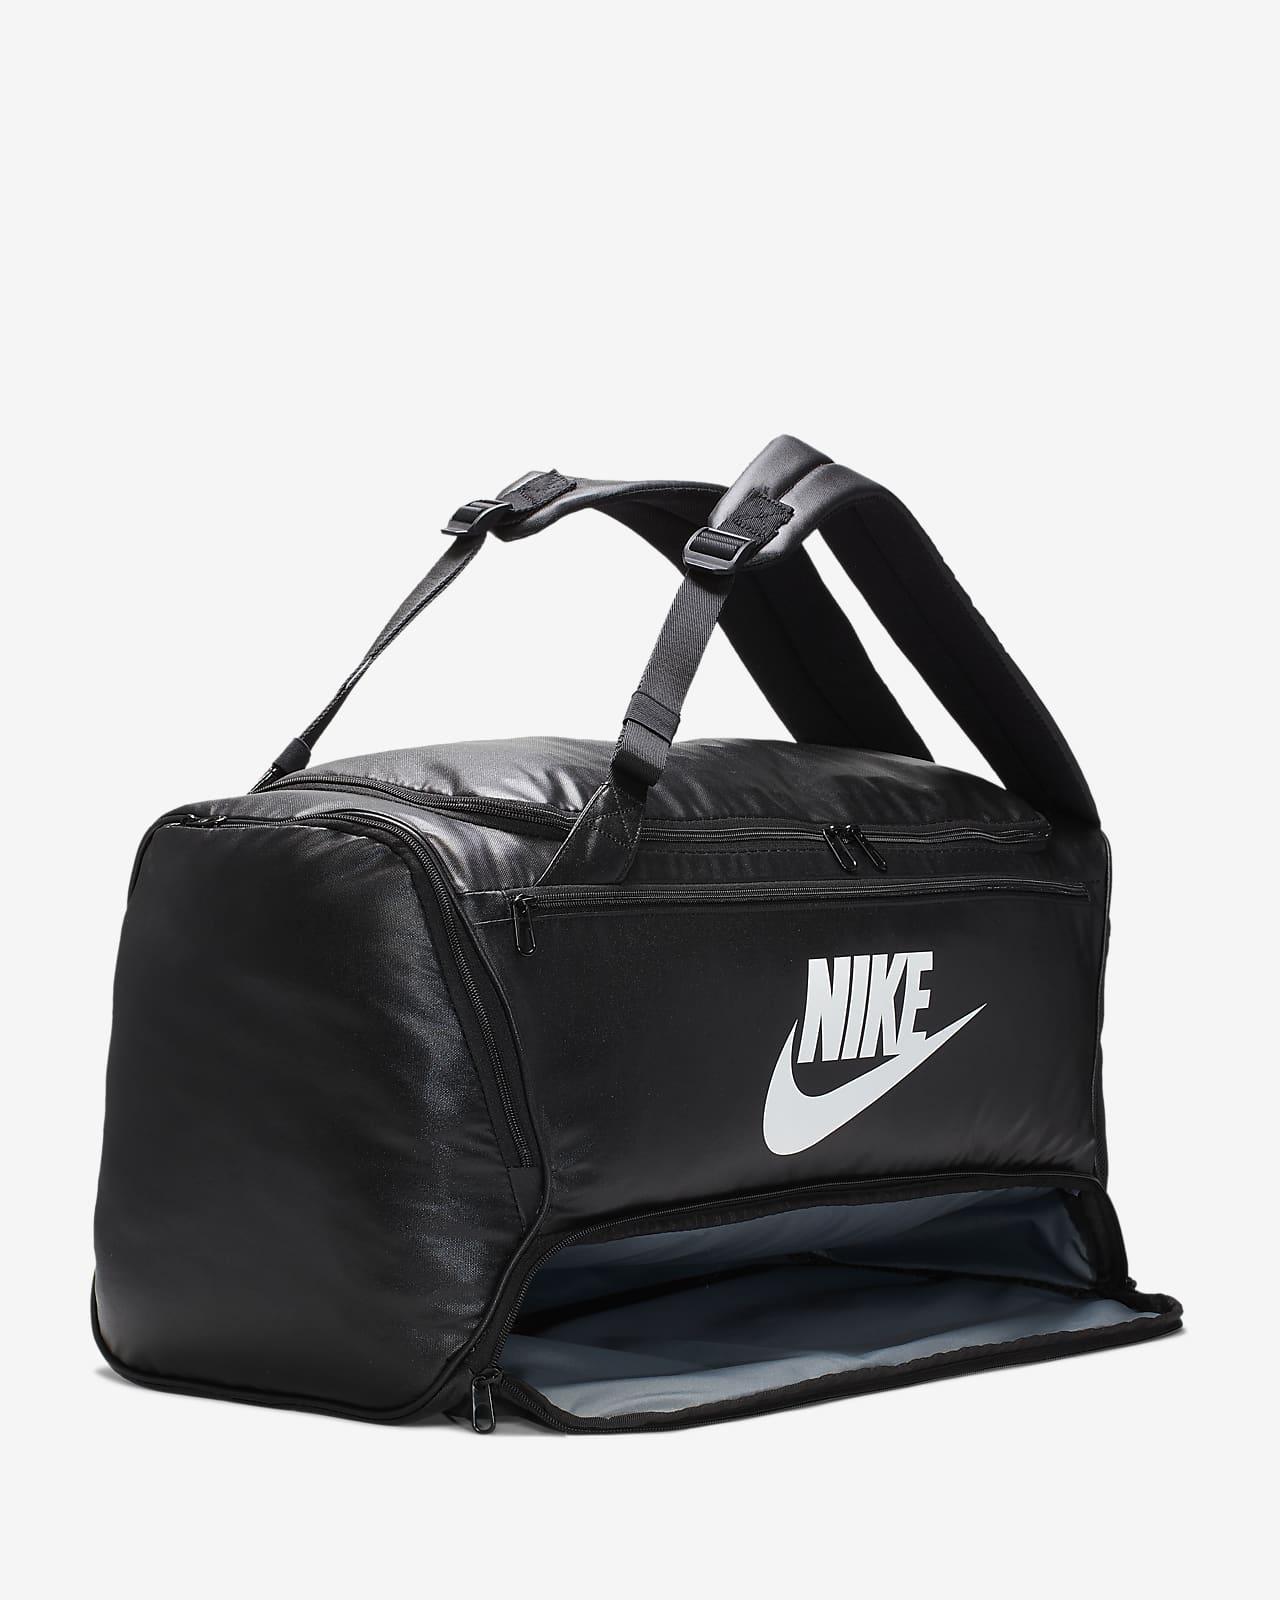 Nike Sac à dos en filet BA5388010 Brasilia Sac à dos Training Sac noir mochila